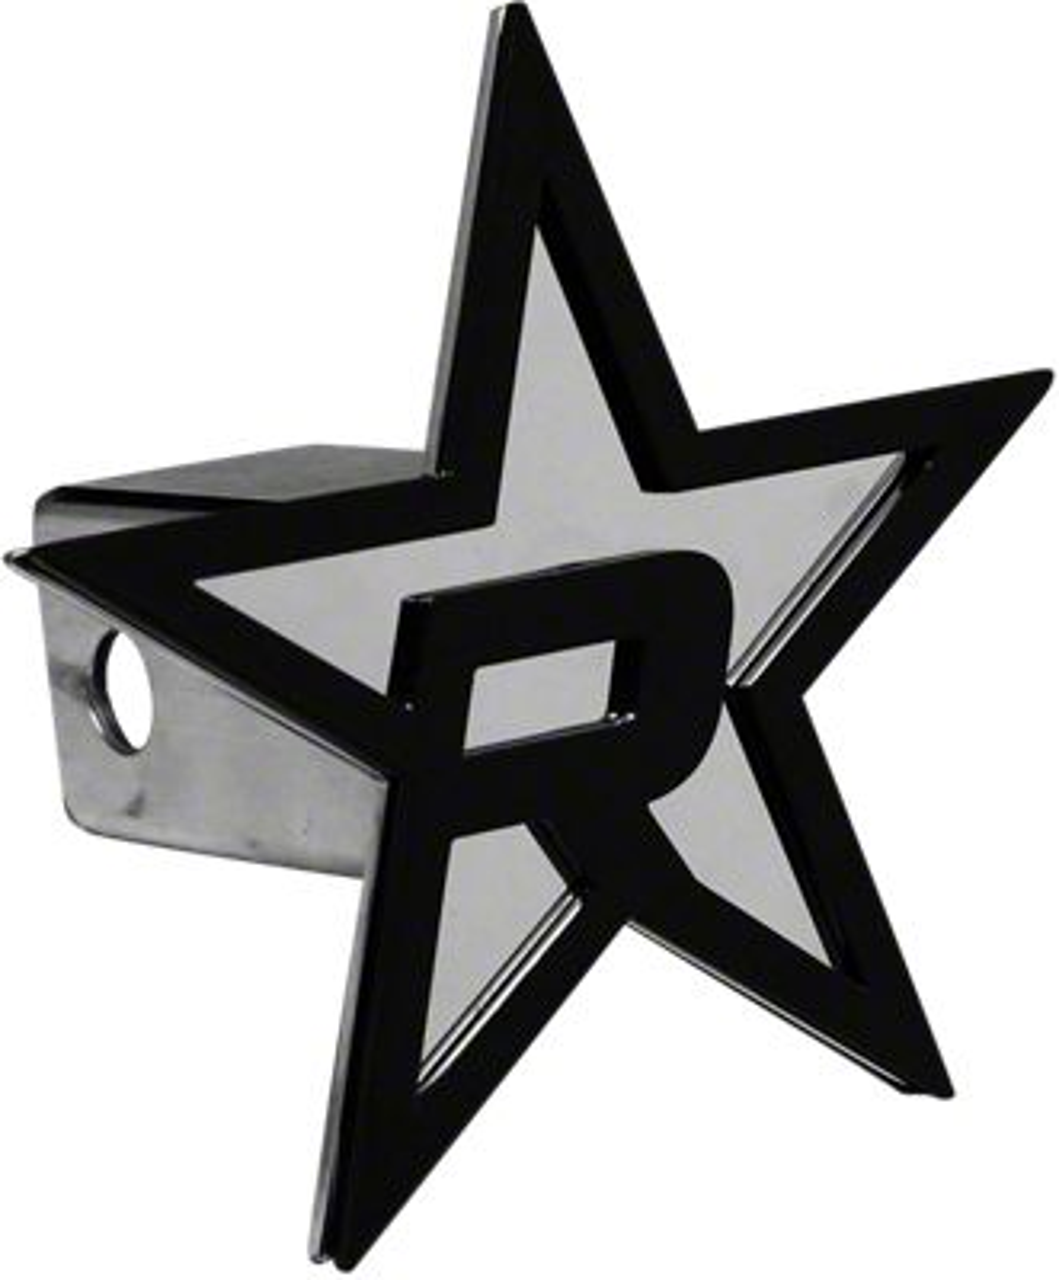 RBP Chrome/Black Star Hitch Cover (02-19 RAM 1500)